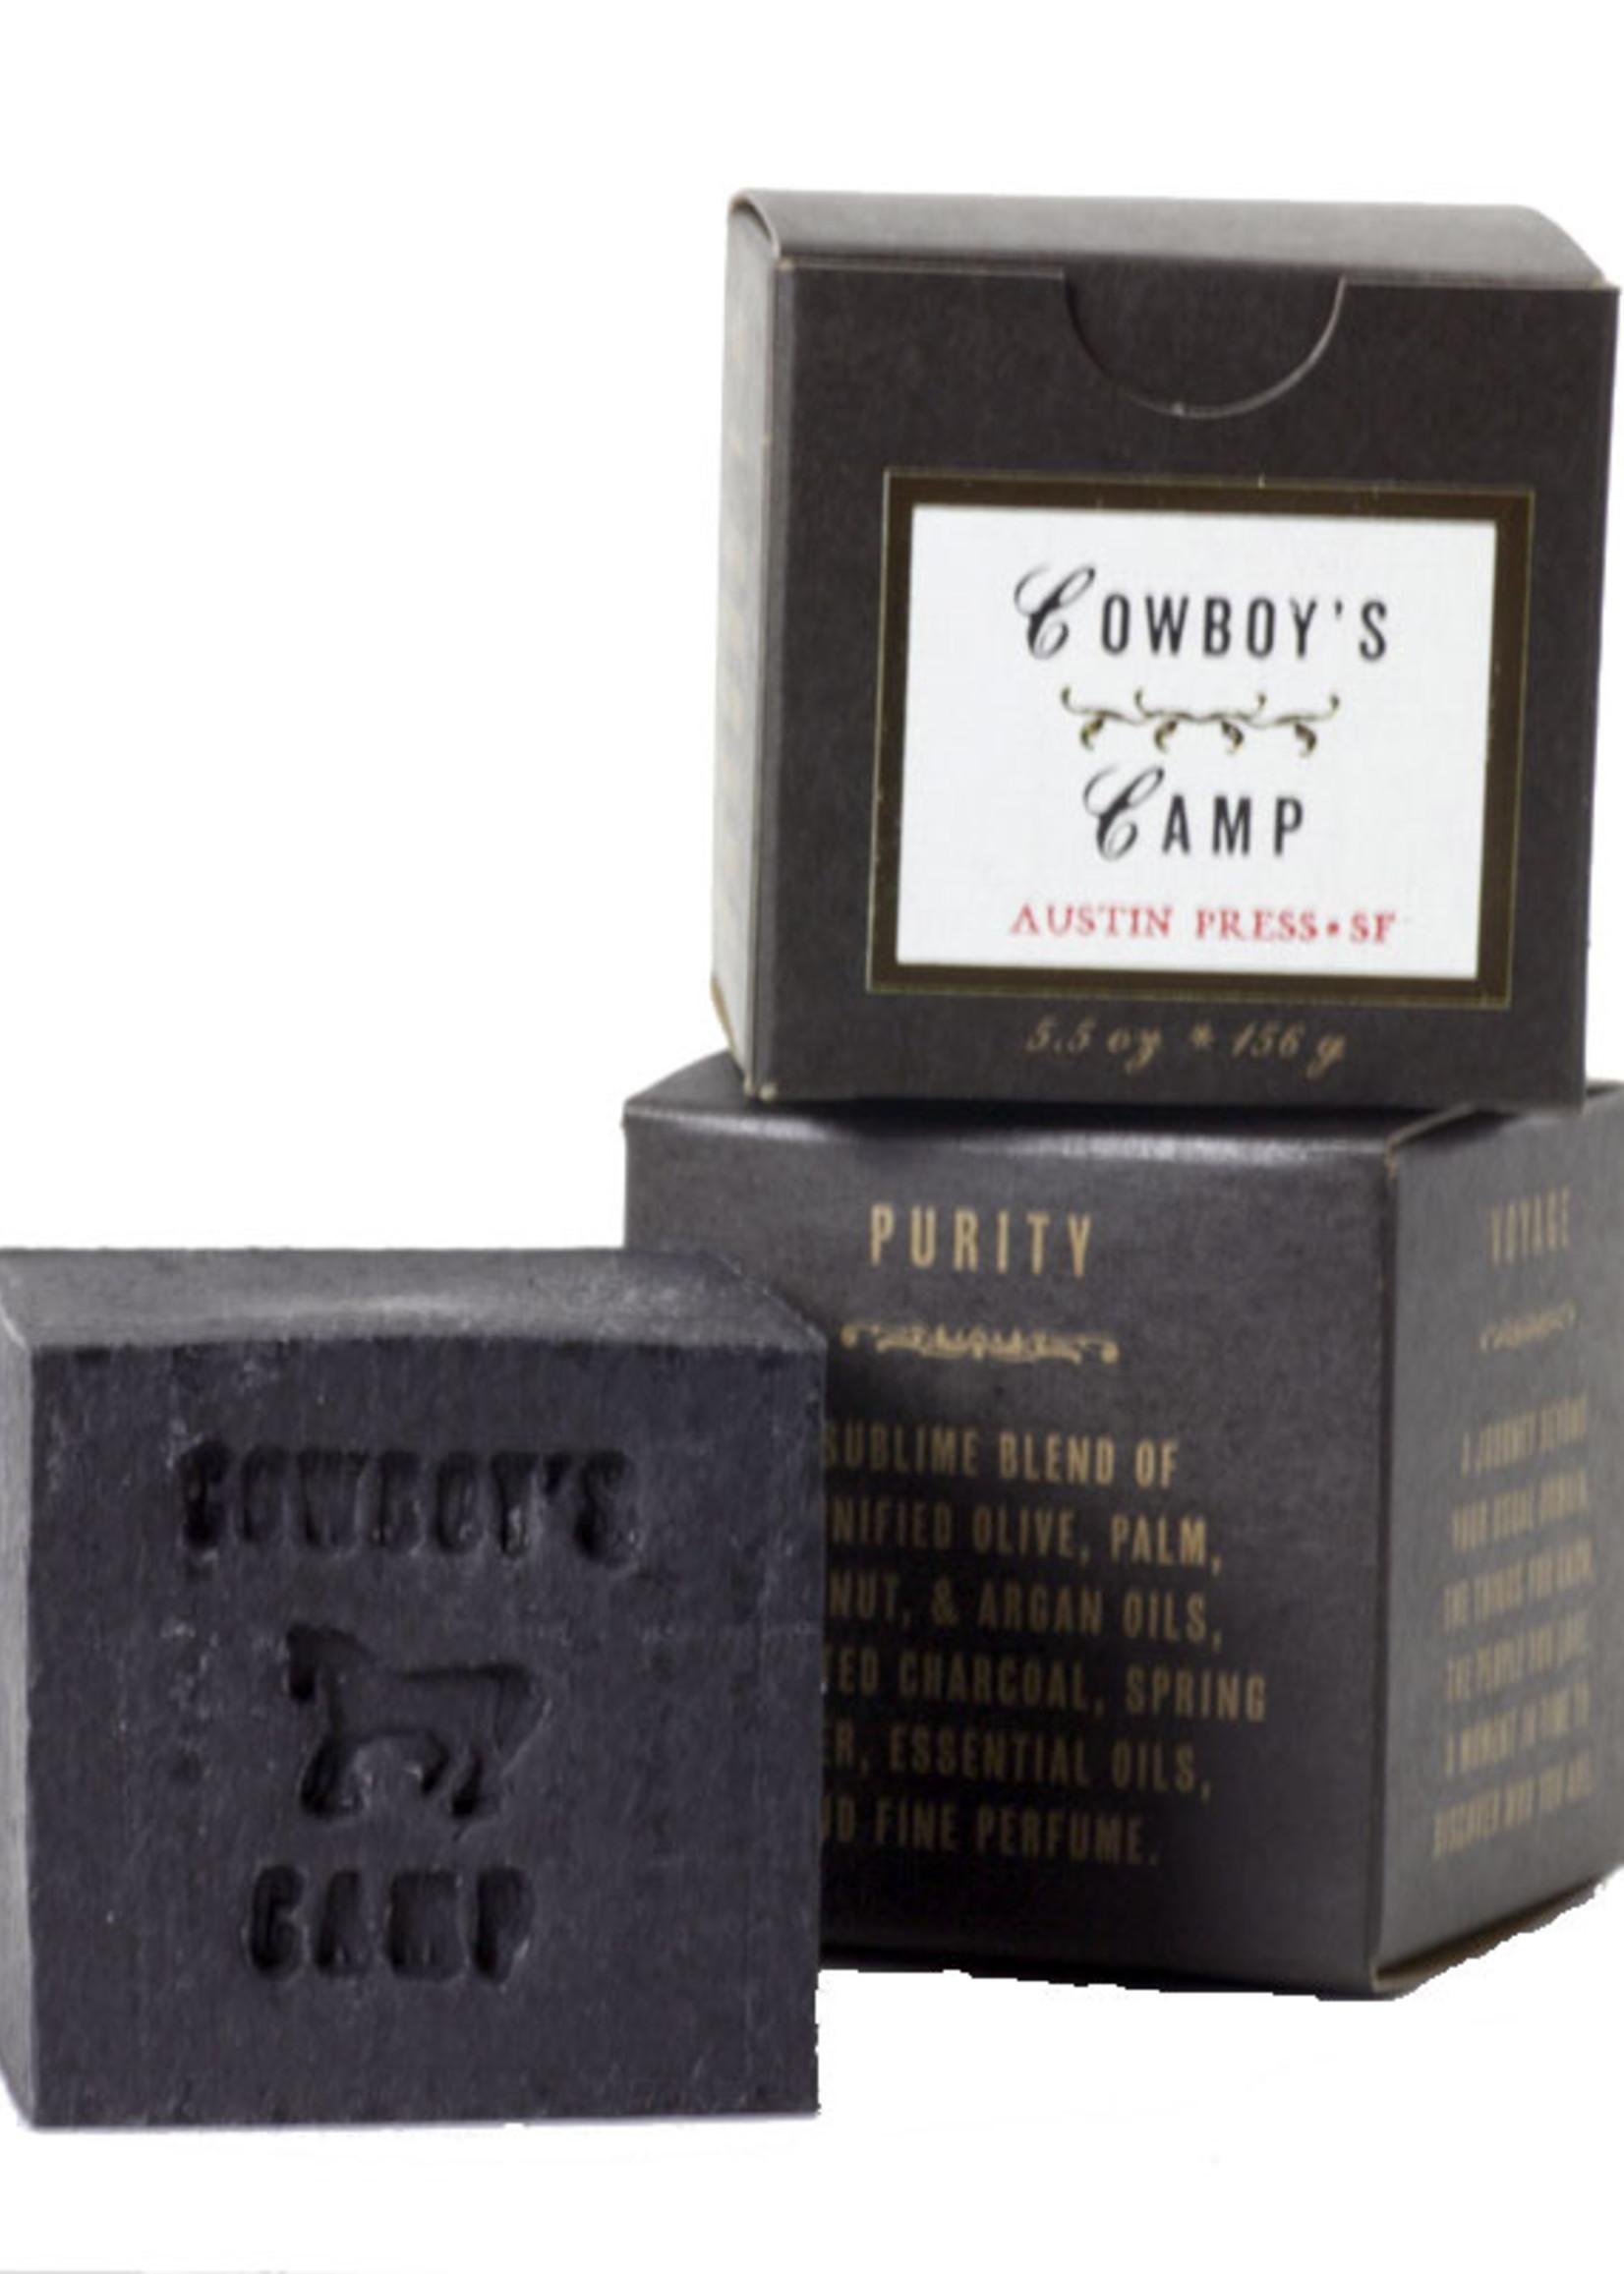 Austin Press Cowboy's Camp Soap